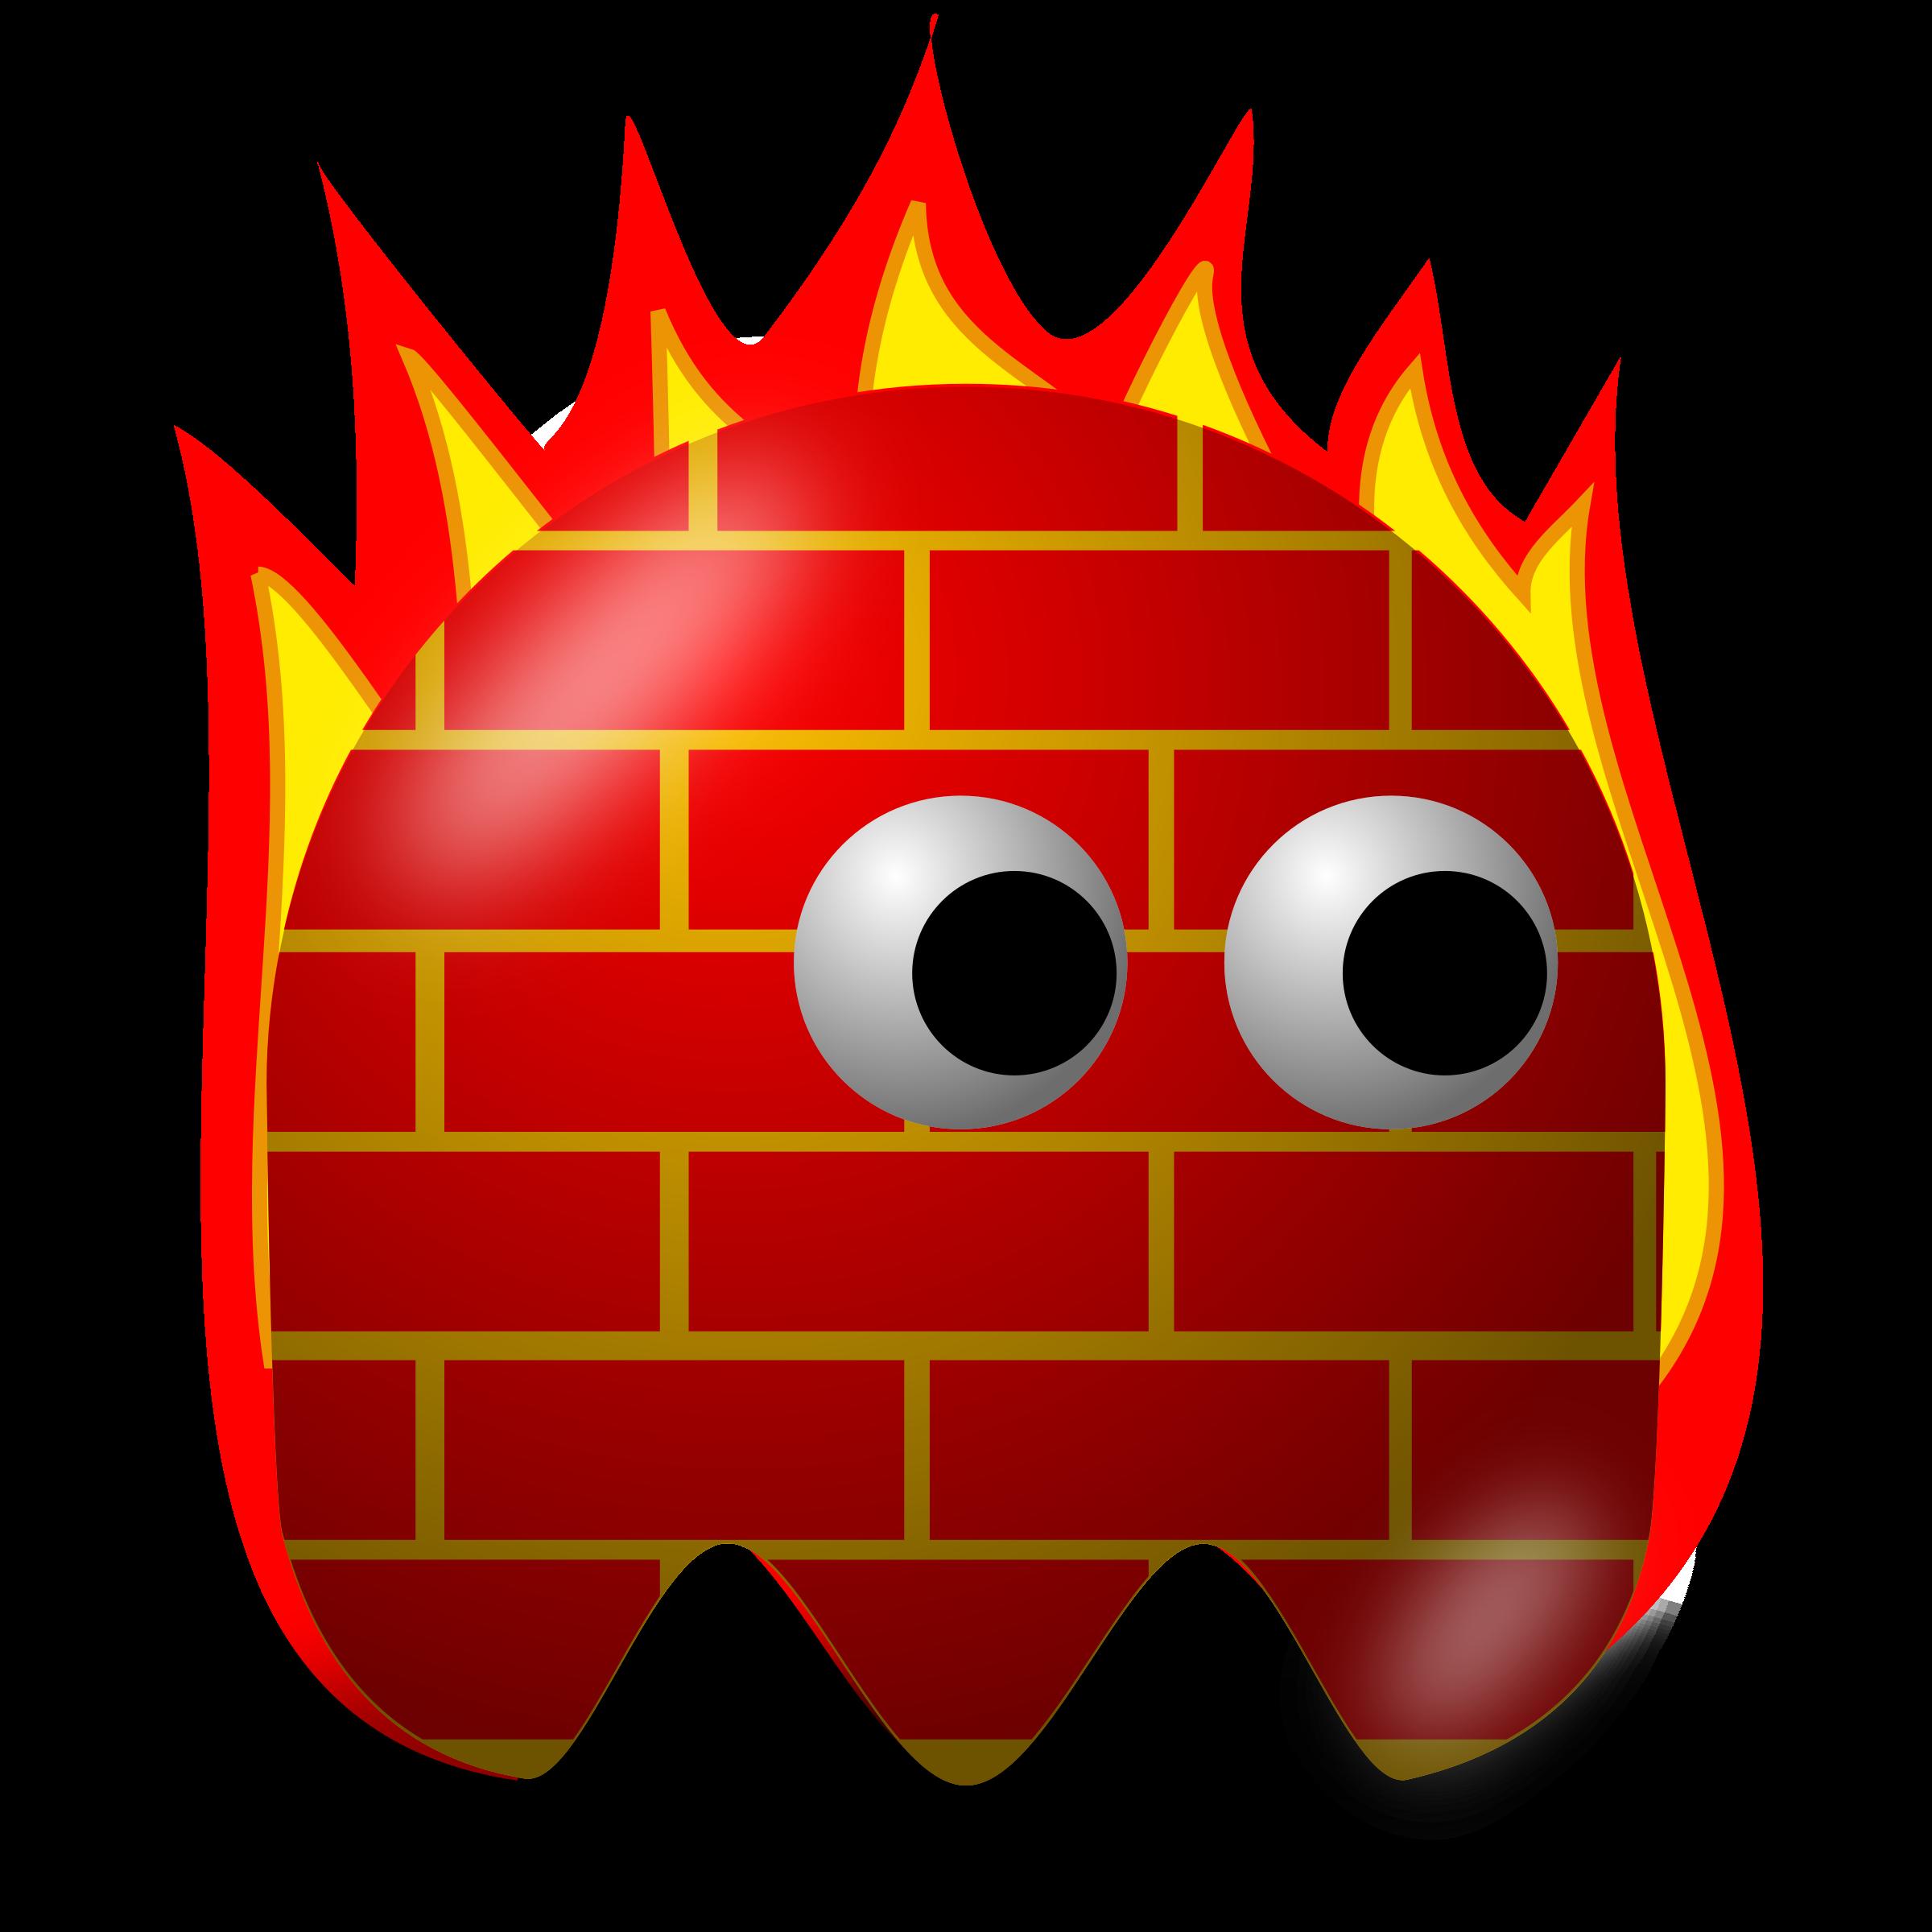 clipart padepokan firewall fat guy clipart clipart guy thinking